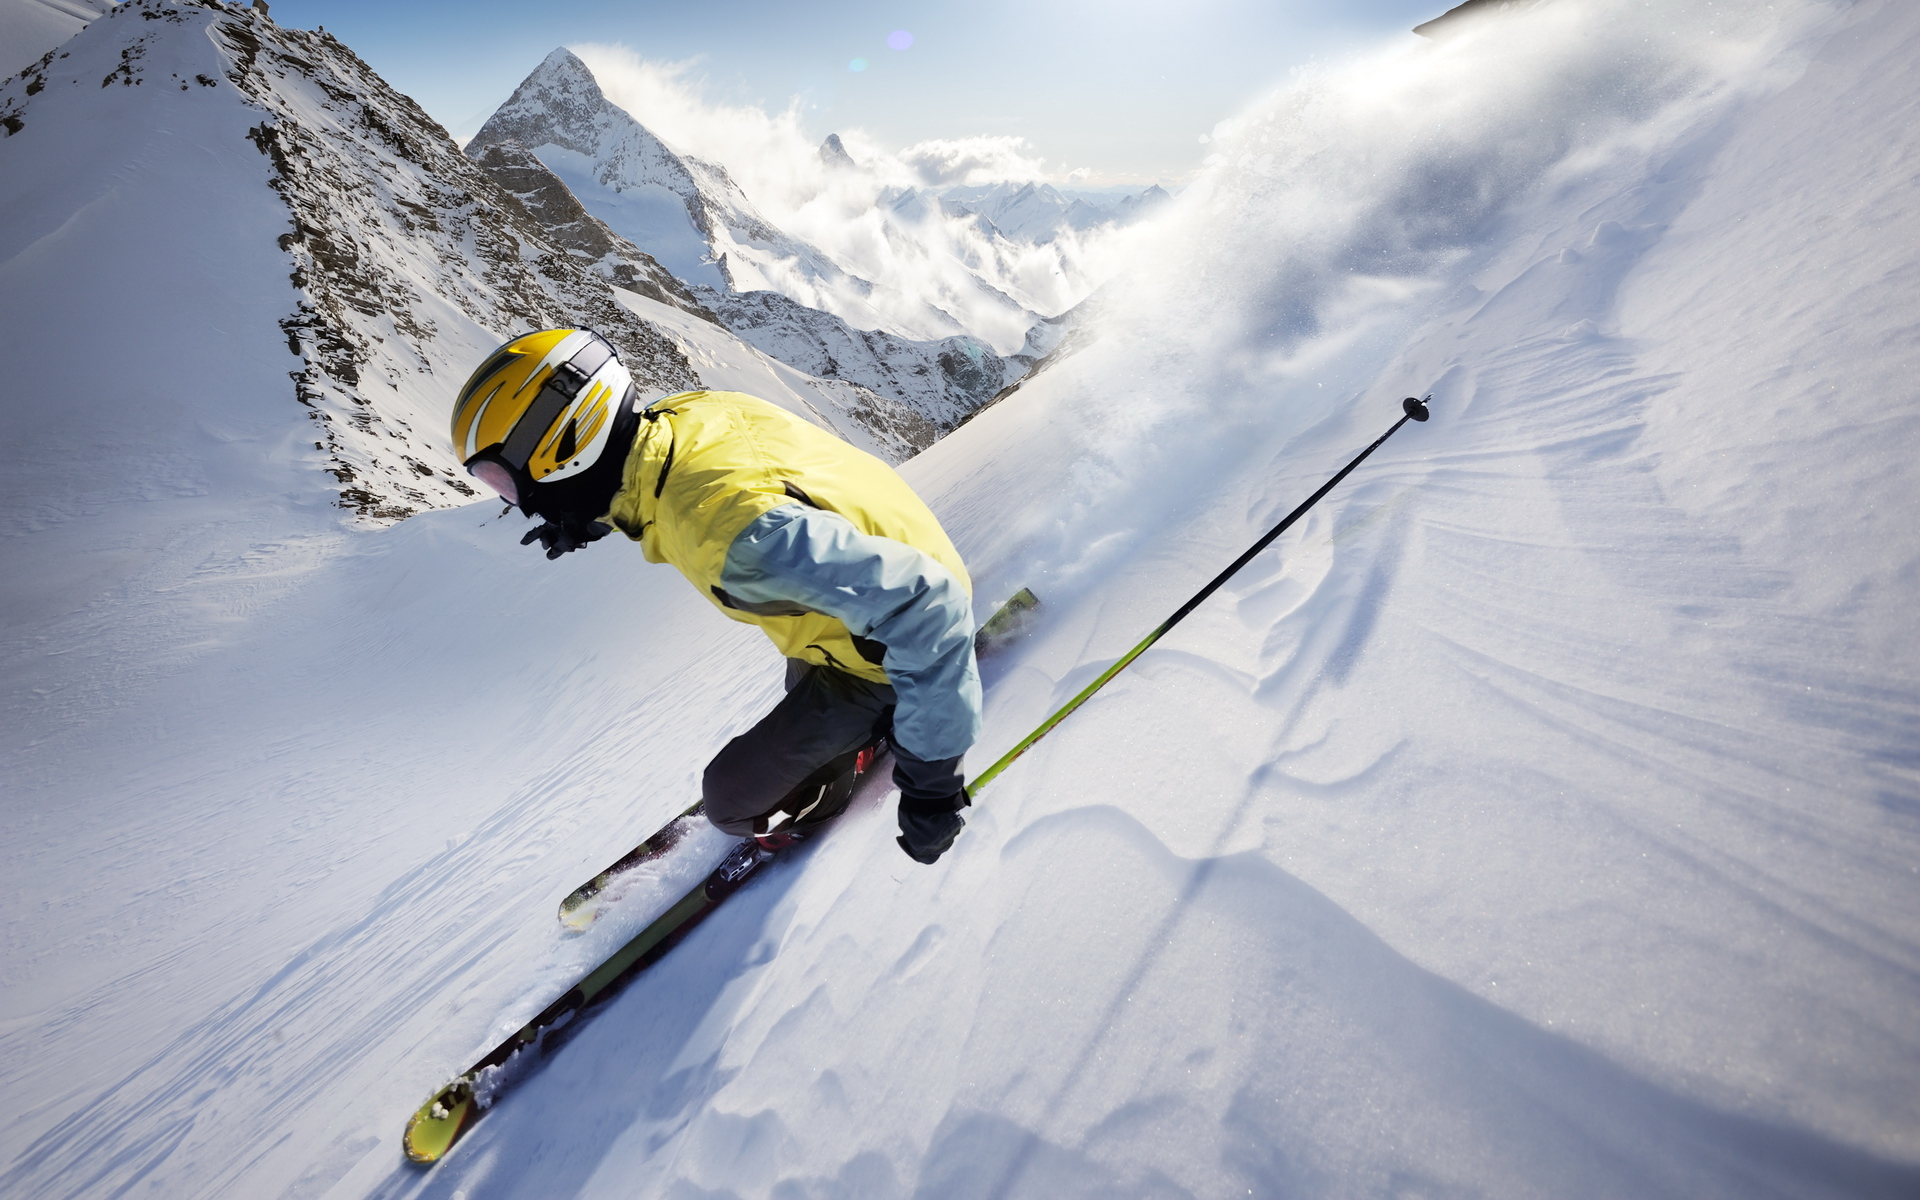 Skiing hd wallpaper background image 1920x1200 id - Ski wallpaper ...